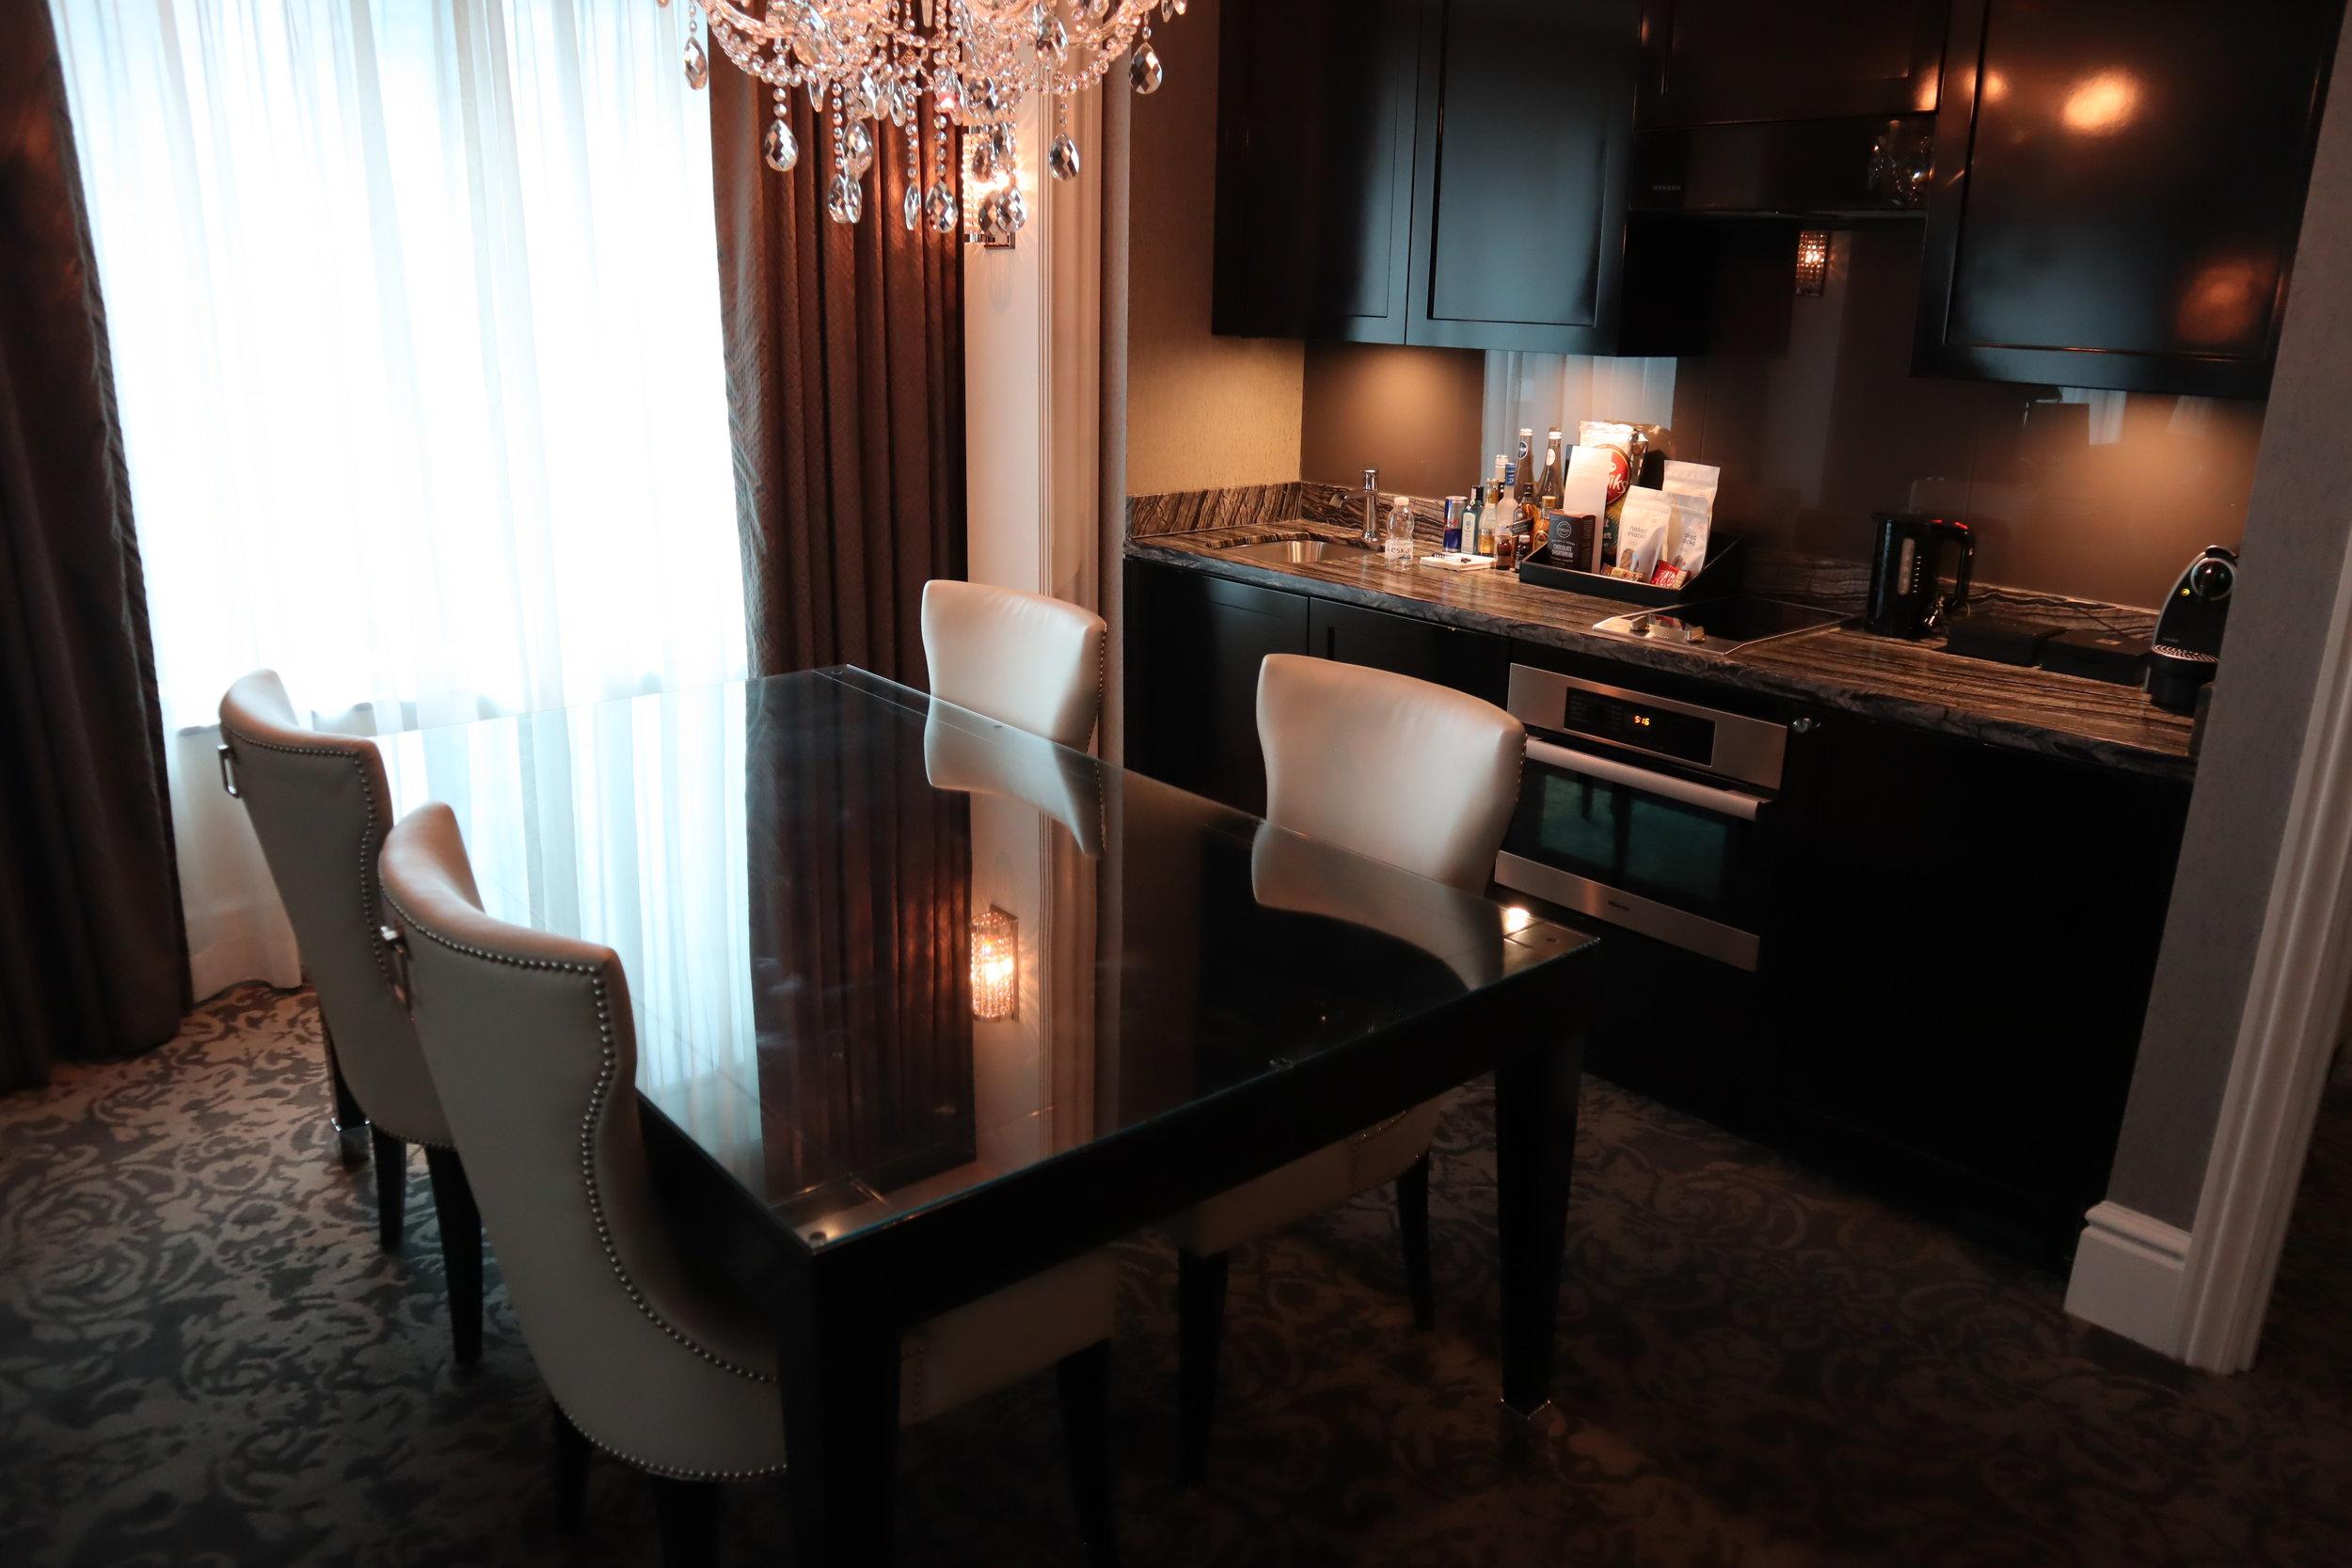 St. Regis Toronto – Two-bedroom suite dining room